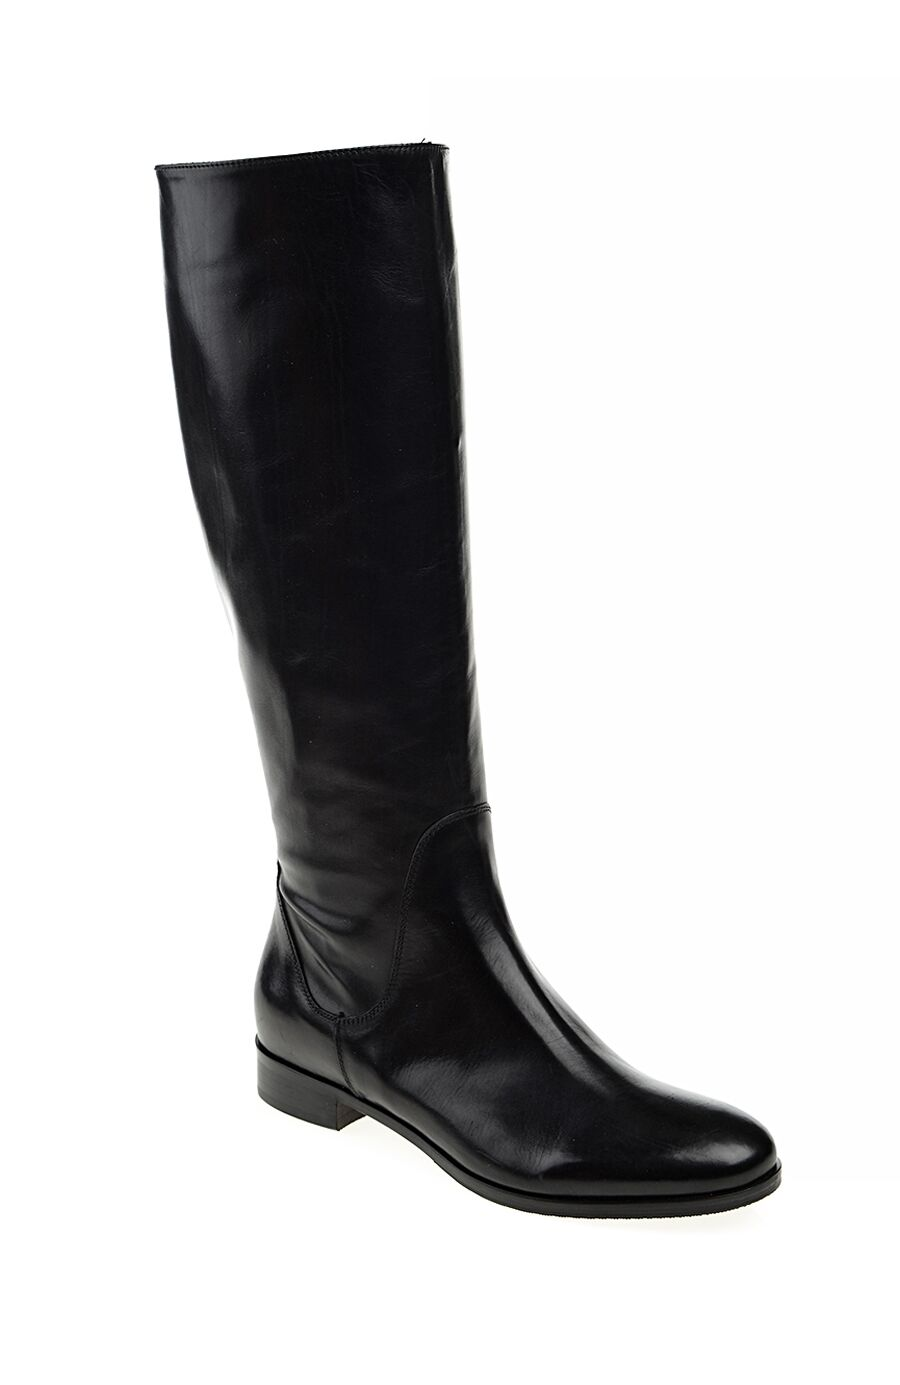 Luca Grossı Siyah Deri Çizme – 595.0 TL